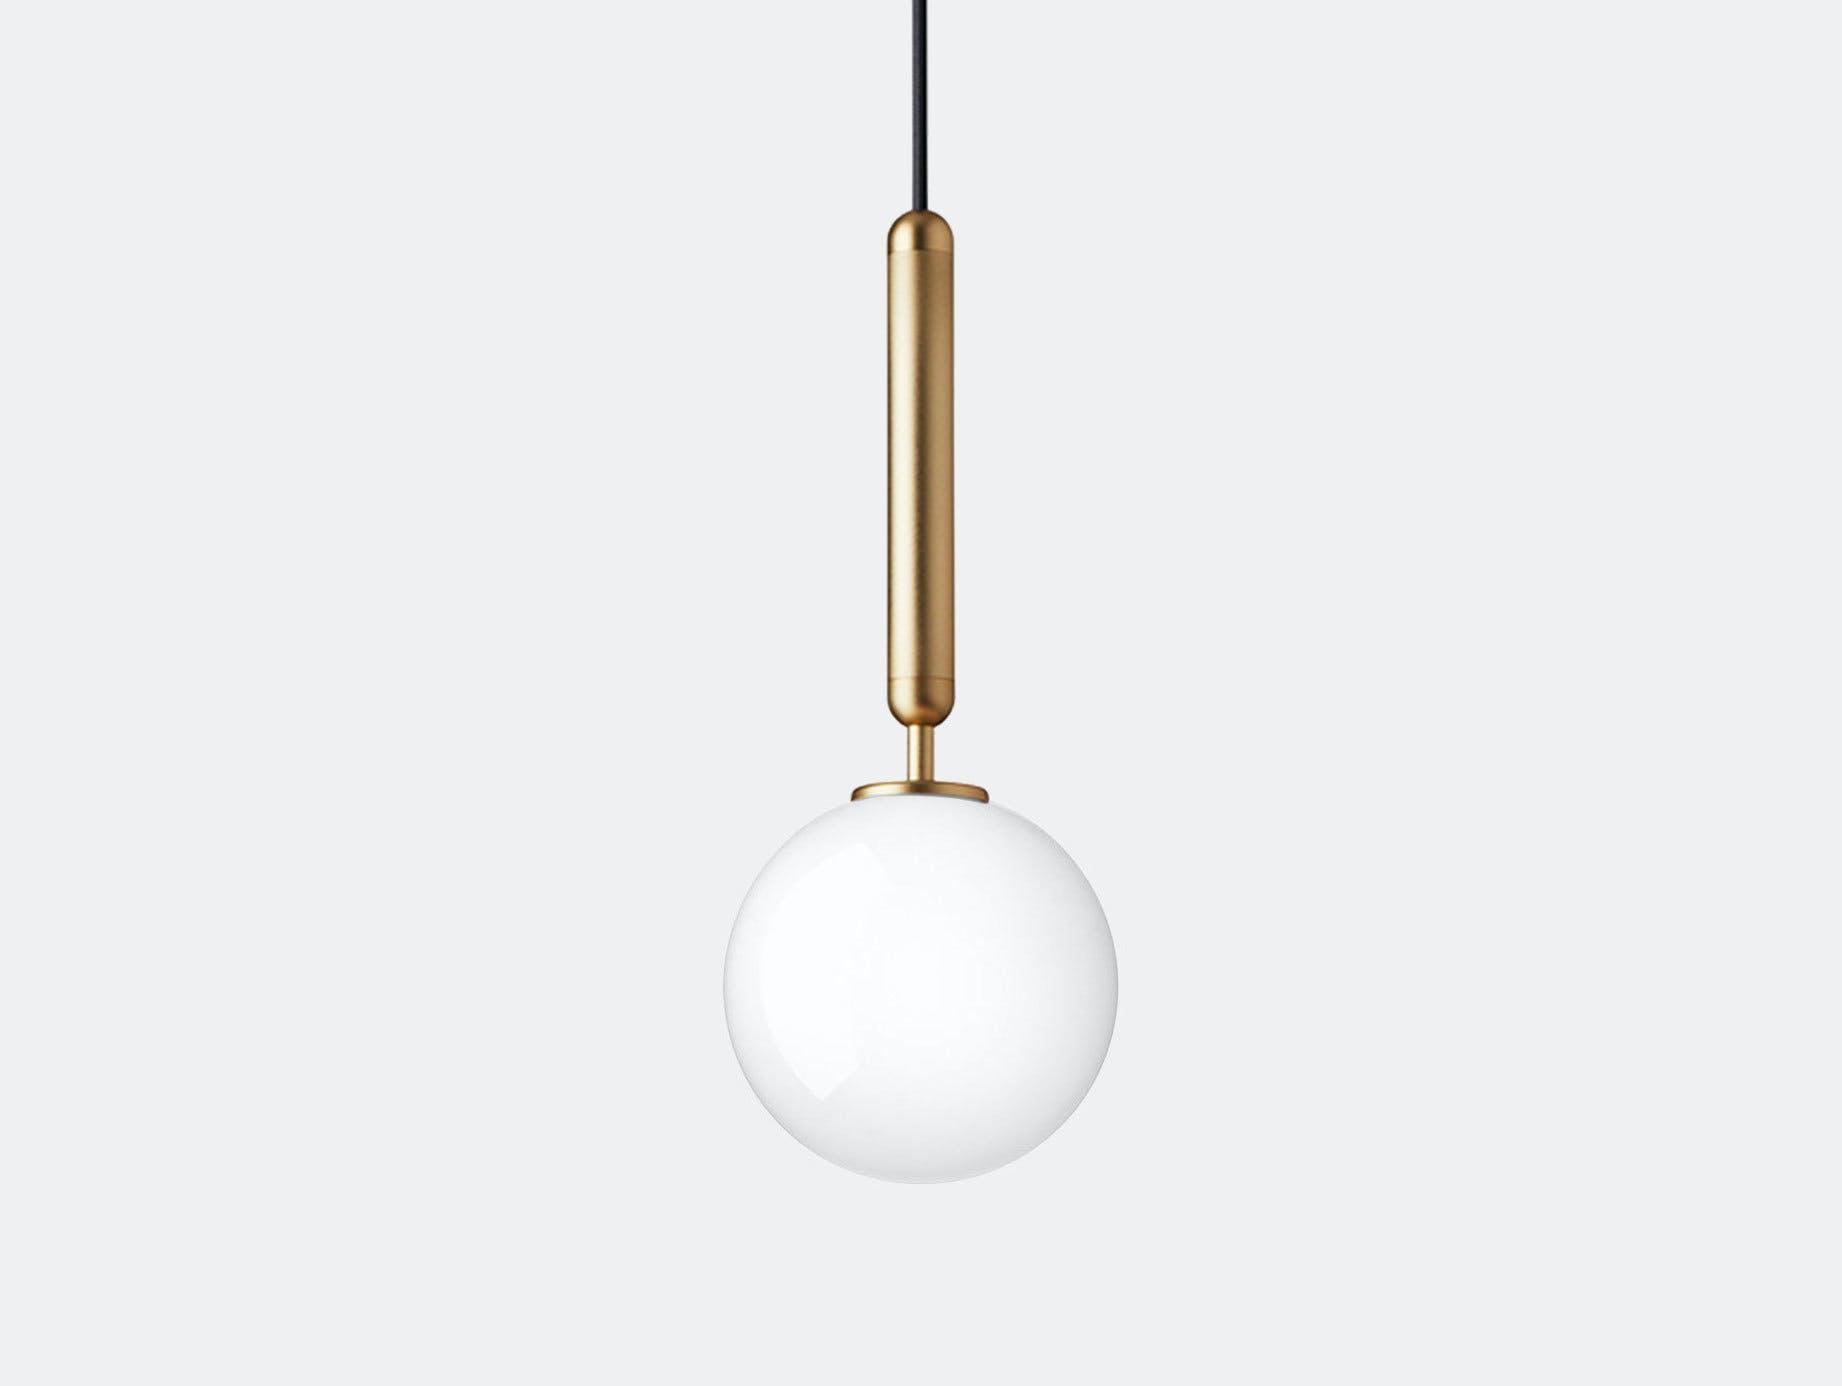 Nuura Miira 1 Pendant Light brass opal glass Sofie Refer